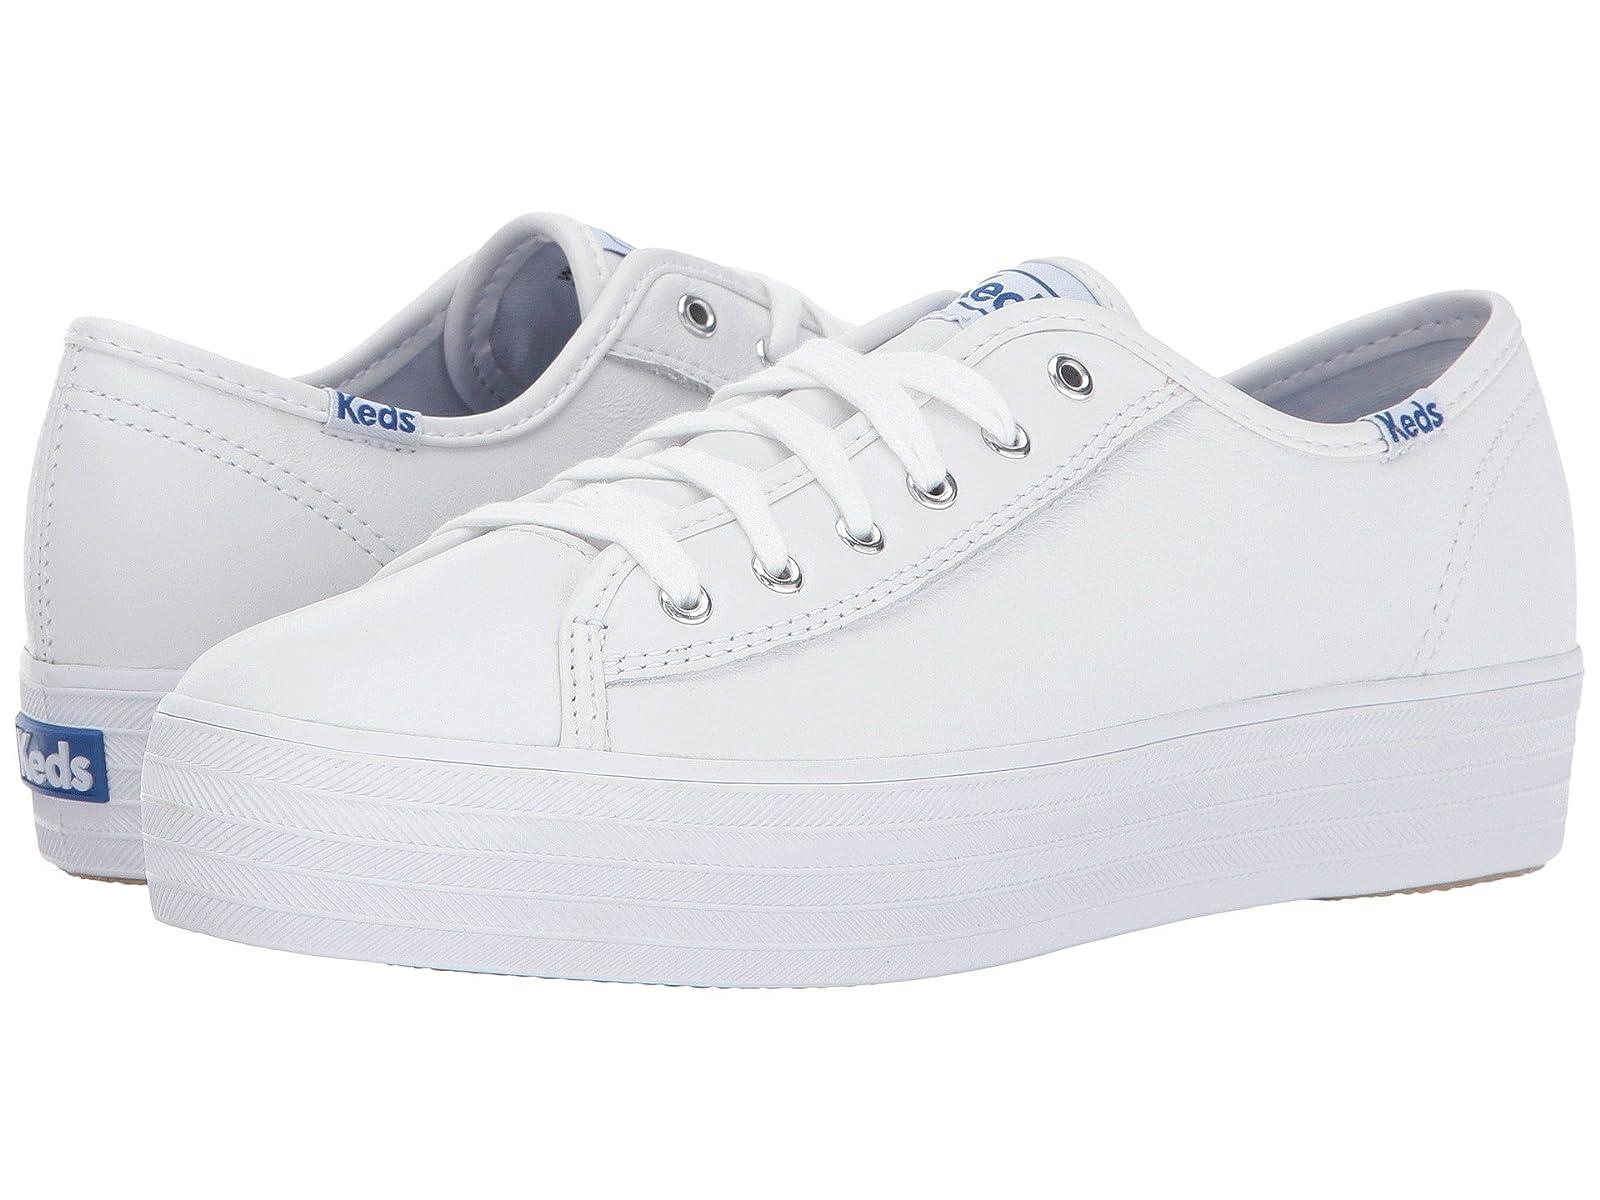 Keds Triple Kick LeatherAtmospheric grades have affordable shoes